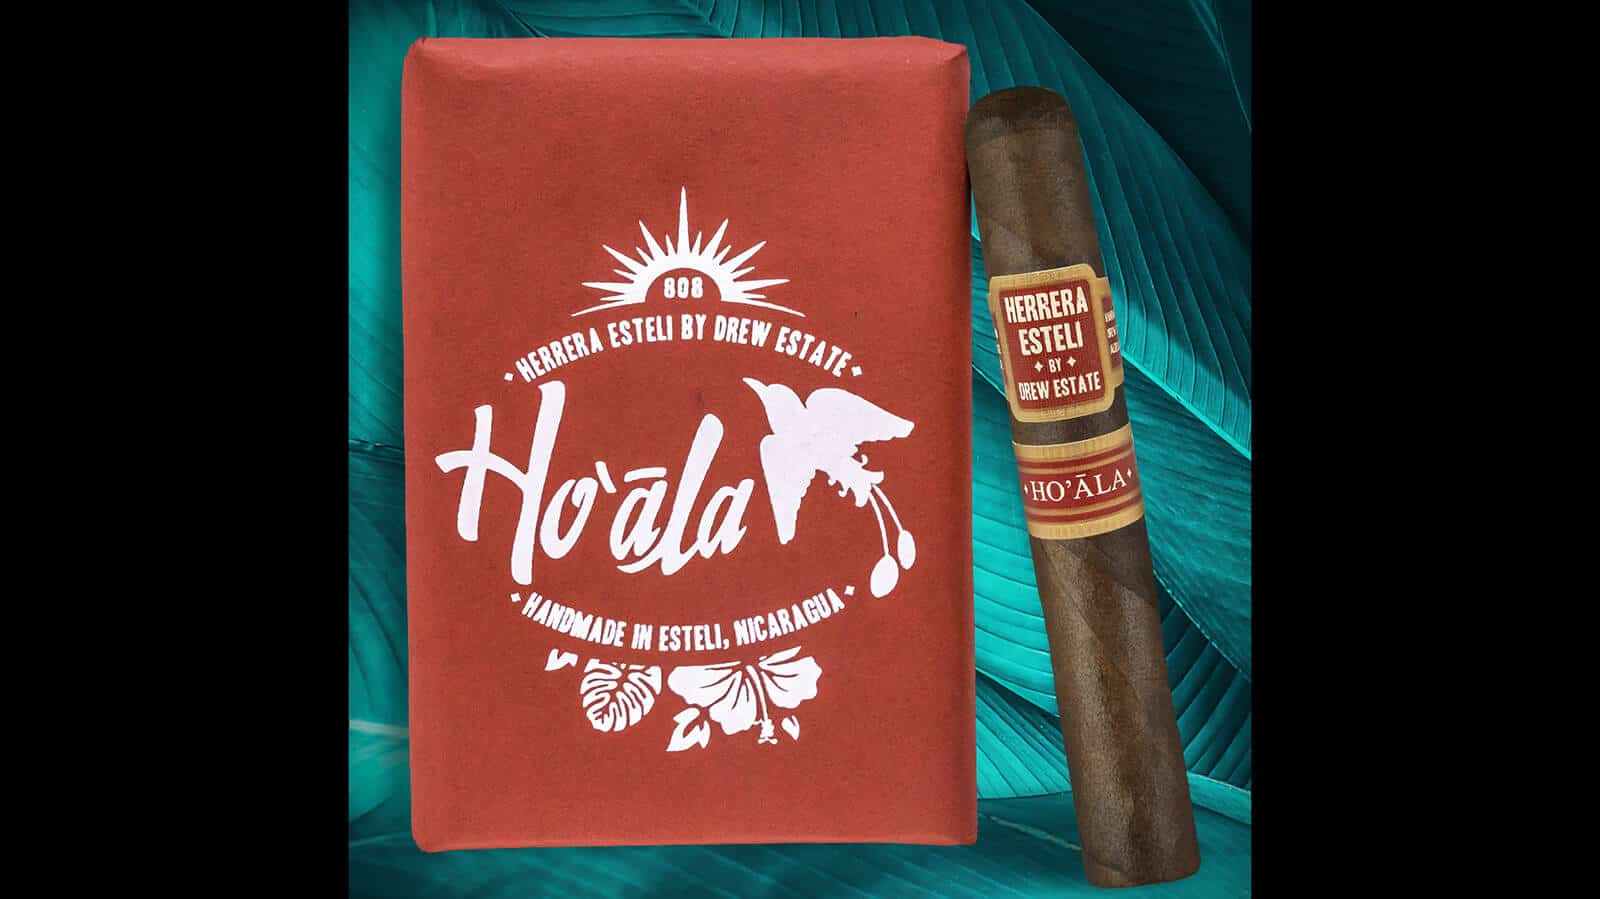 Drew Estate Introduces Herrera Esteli Ho'ala Tienda Exclusiva For Hawaii